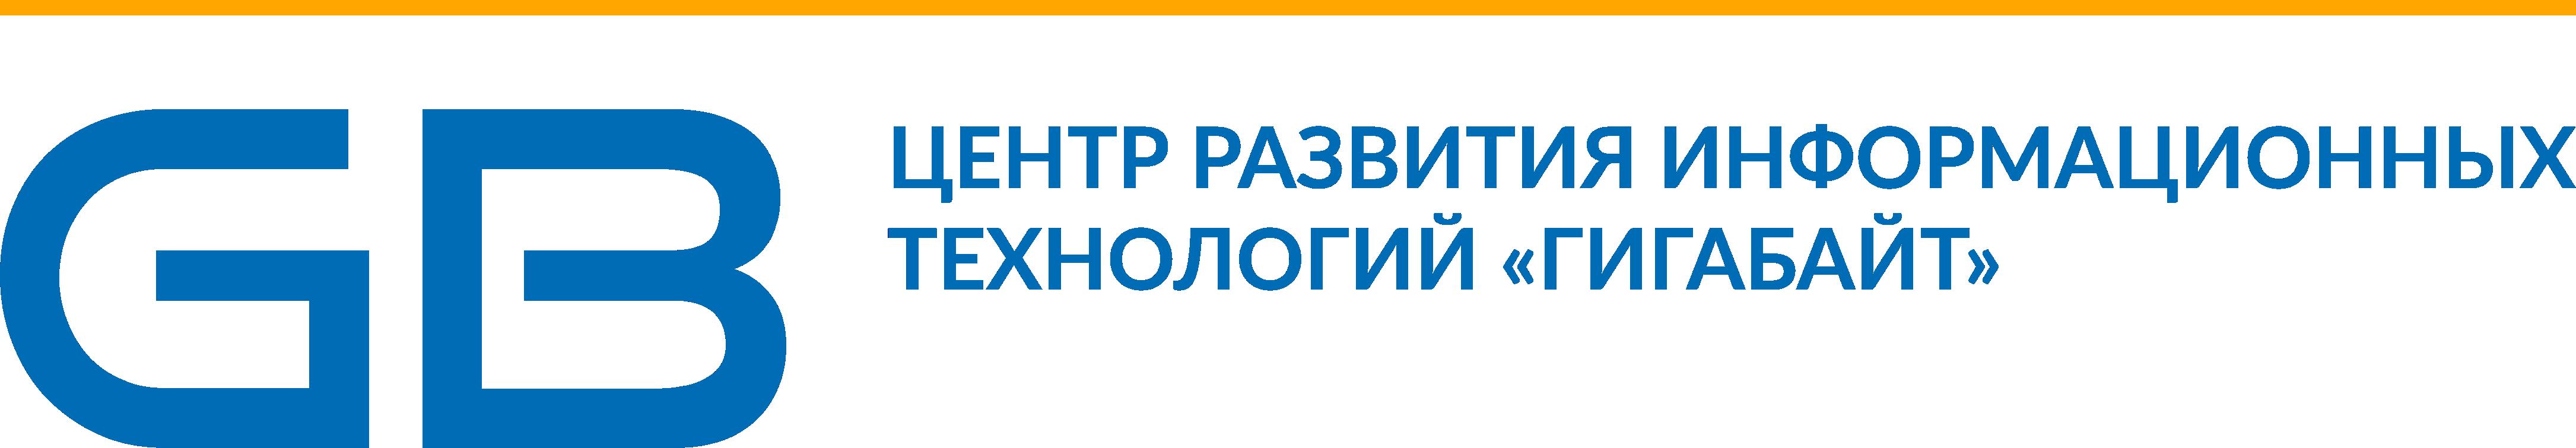 "Интернет-оператор ""Гигабайт"" (г. Бахчисарай)"